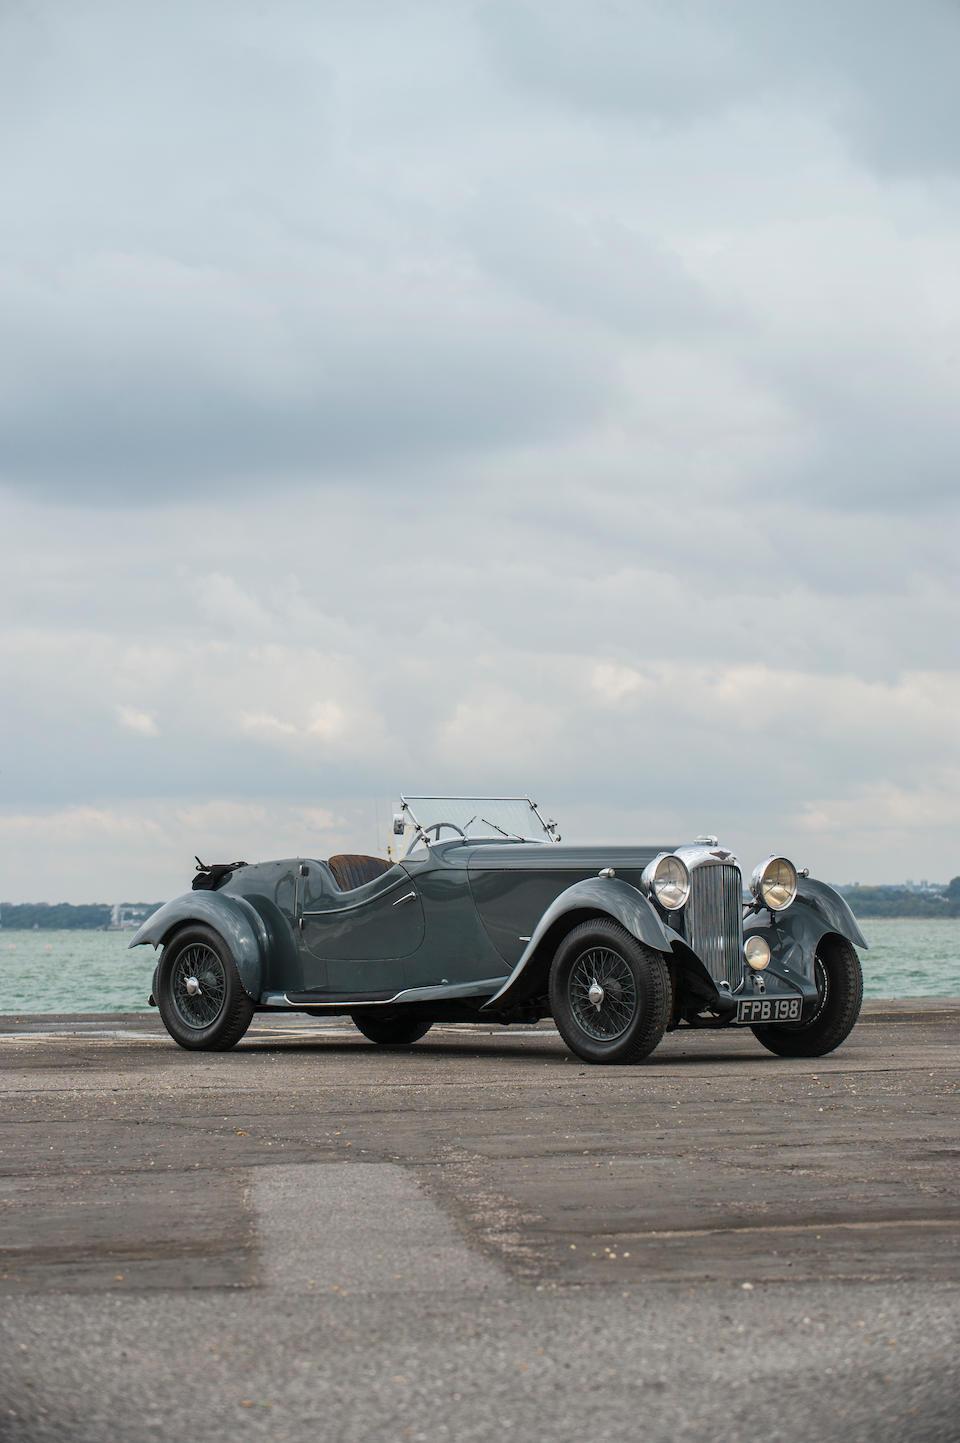 Single family ownership from new,1937 Lagonda 4½-Litre LG45 Rapide Tourer